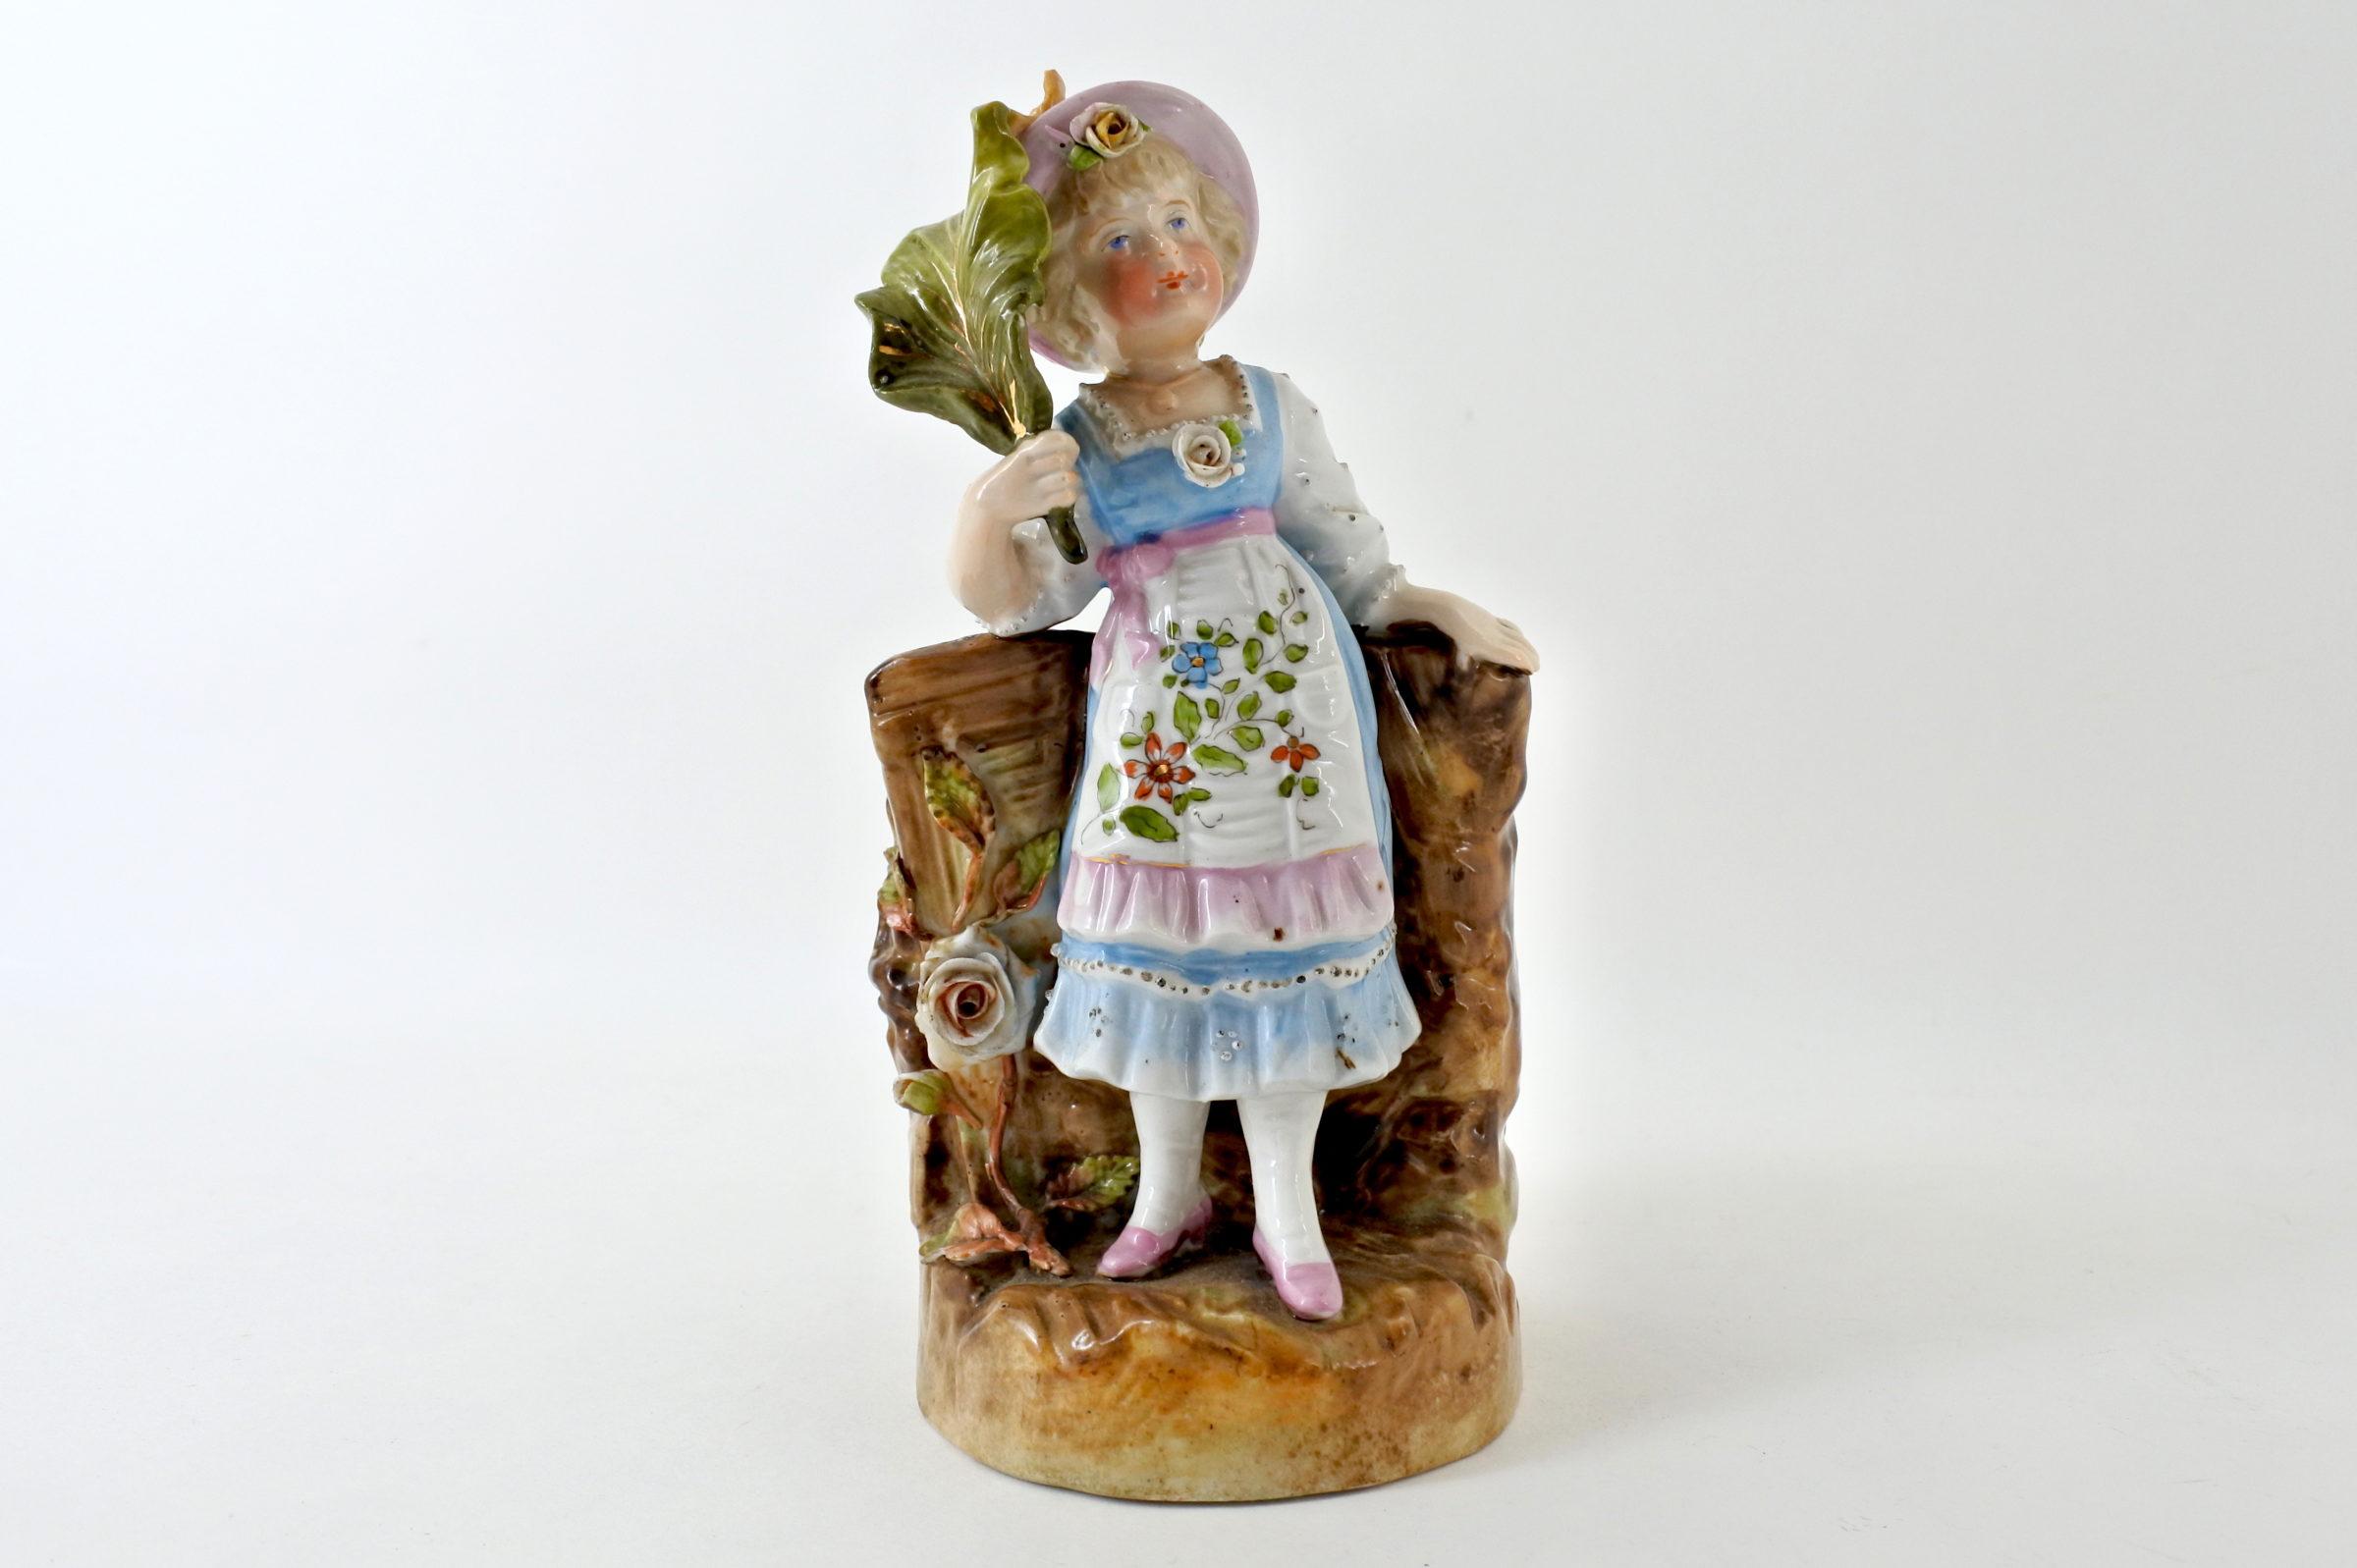 Statuina portafiori in ceramica a forma di bambina